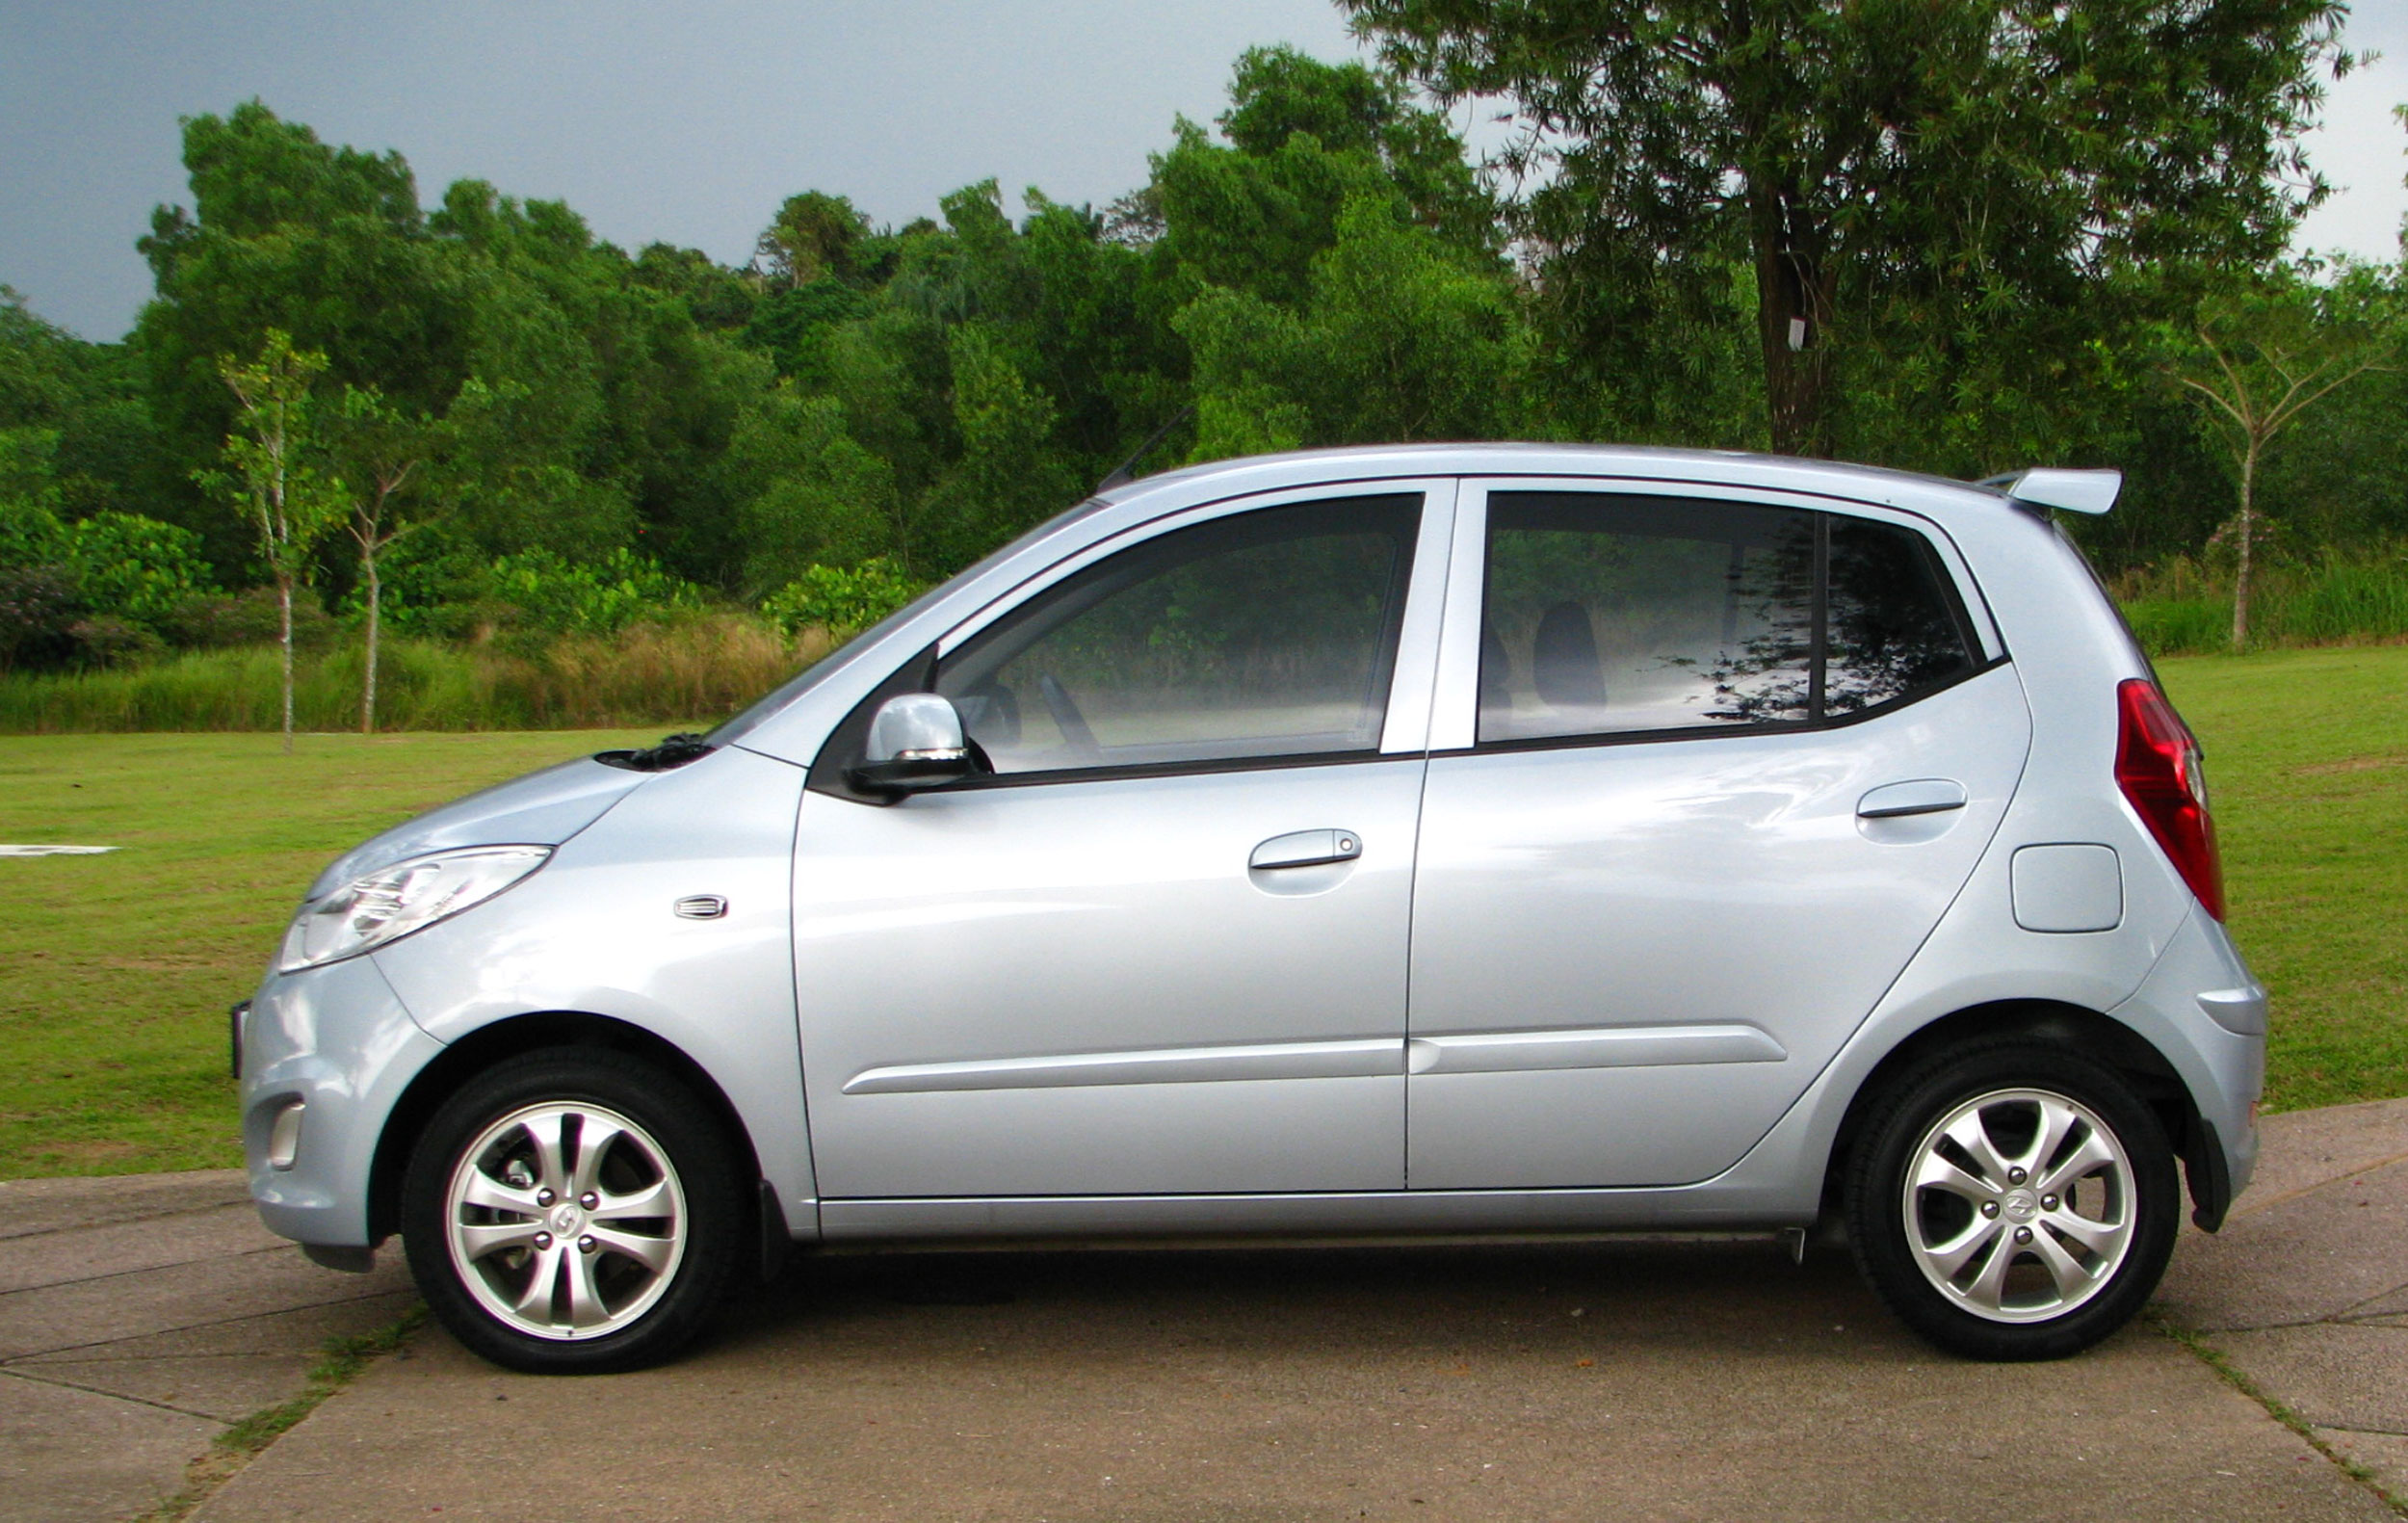 Hyundai I10 Full Test Drive Review A Fun Econobox Image